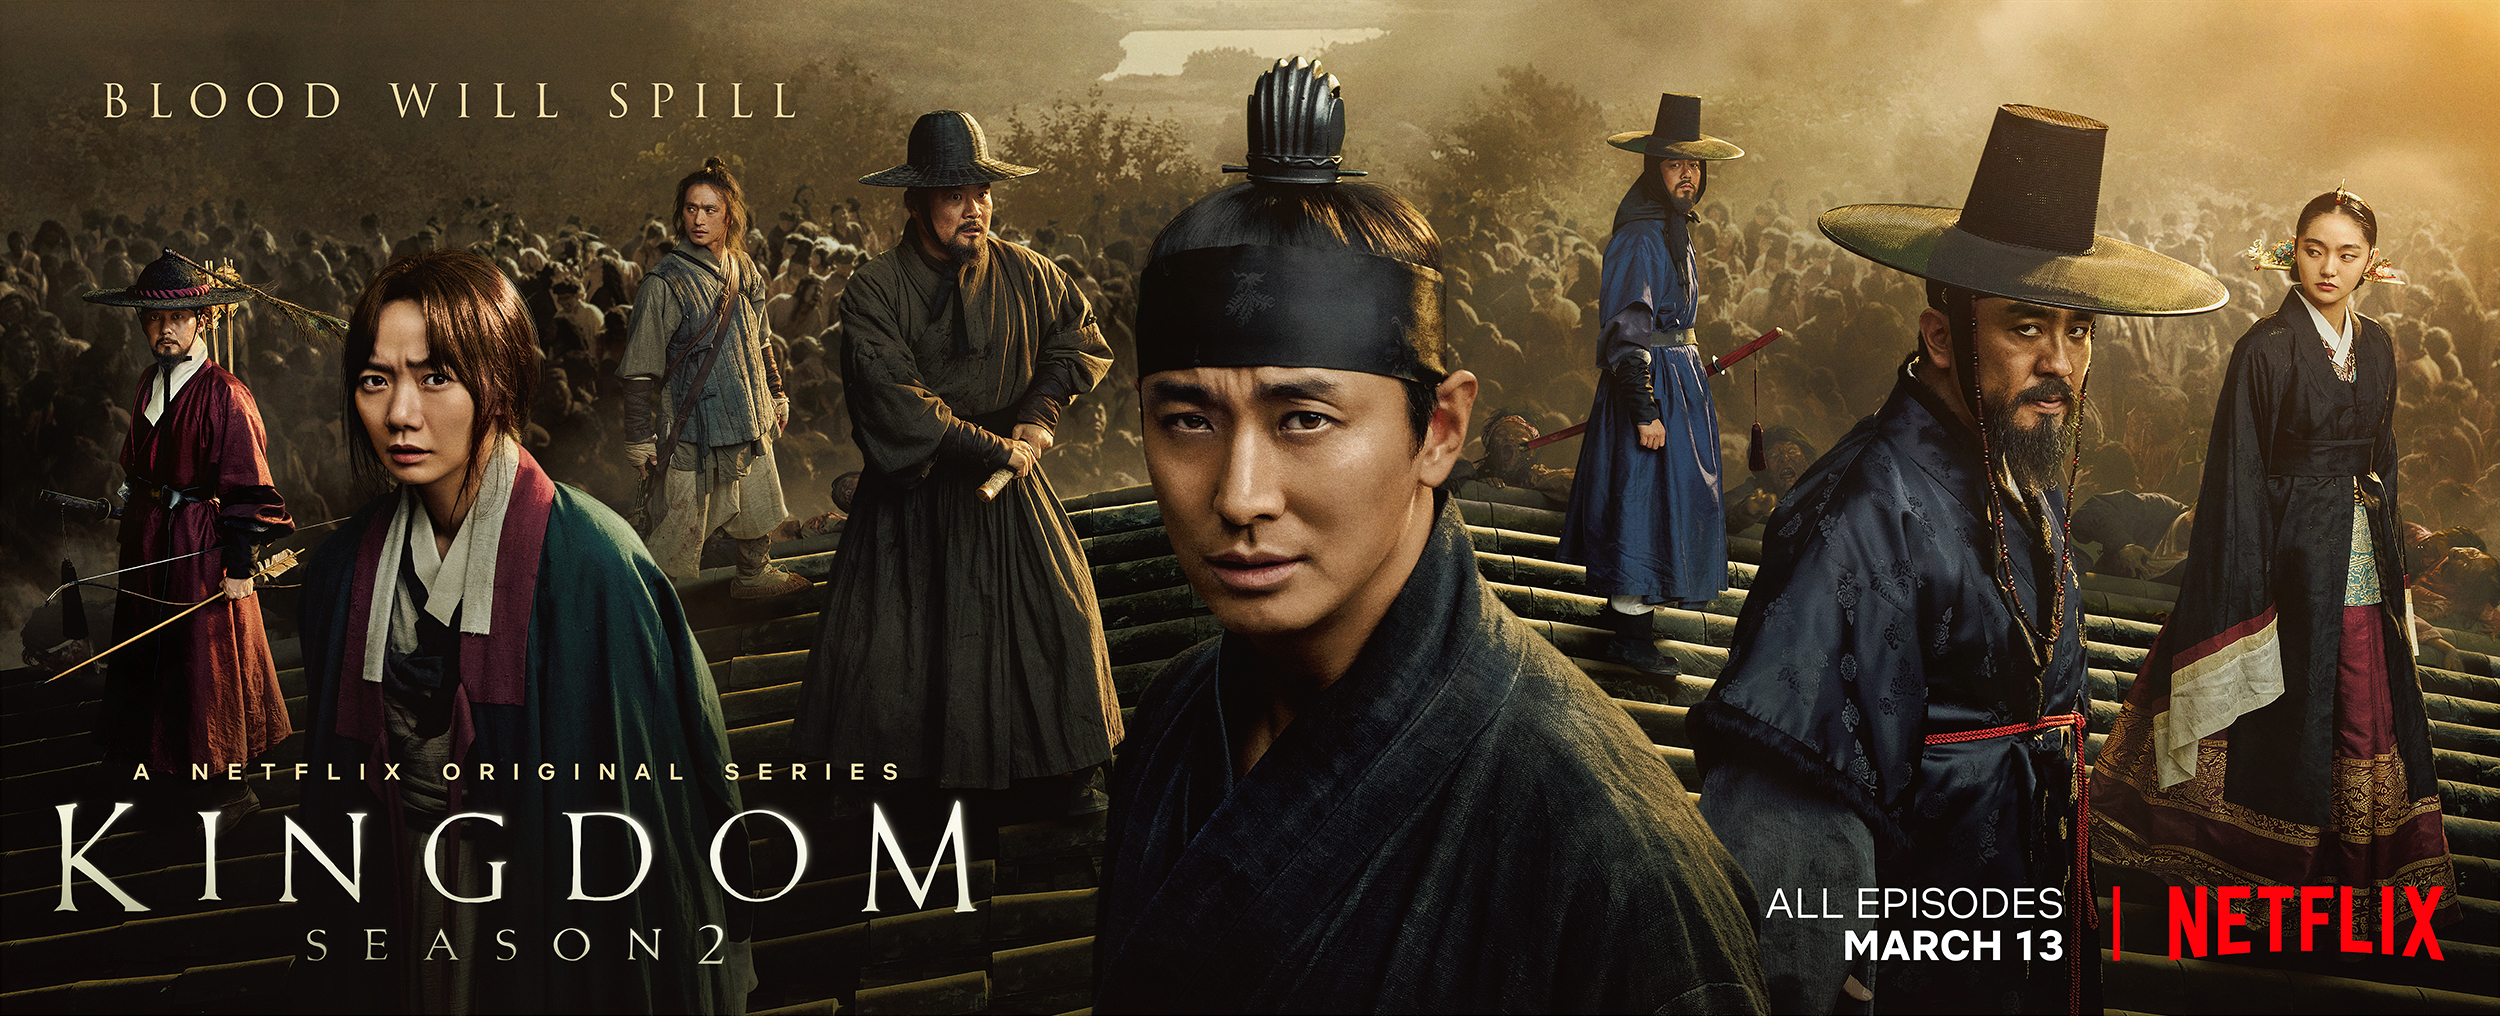 Season 2 of the Epic Korean Original Series Kingdom Premieres on March 13 - Image 1